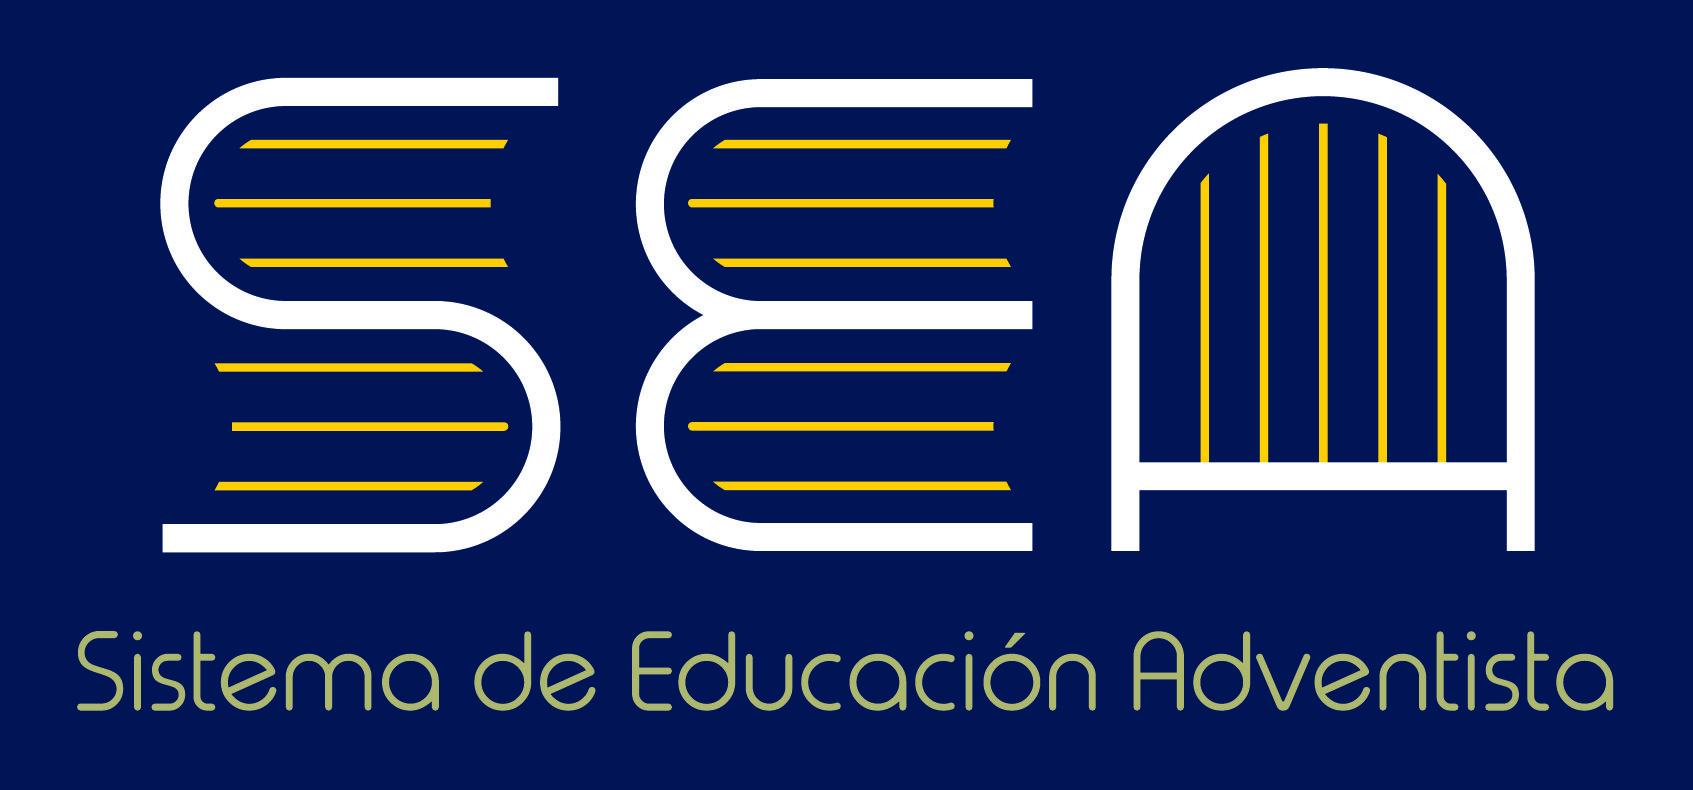 Sistema de Educacion Adventista Union Mexicana Interoceanica ... e9dfb64691d89